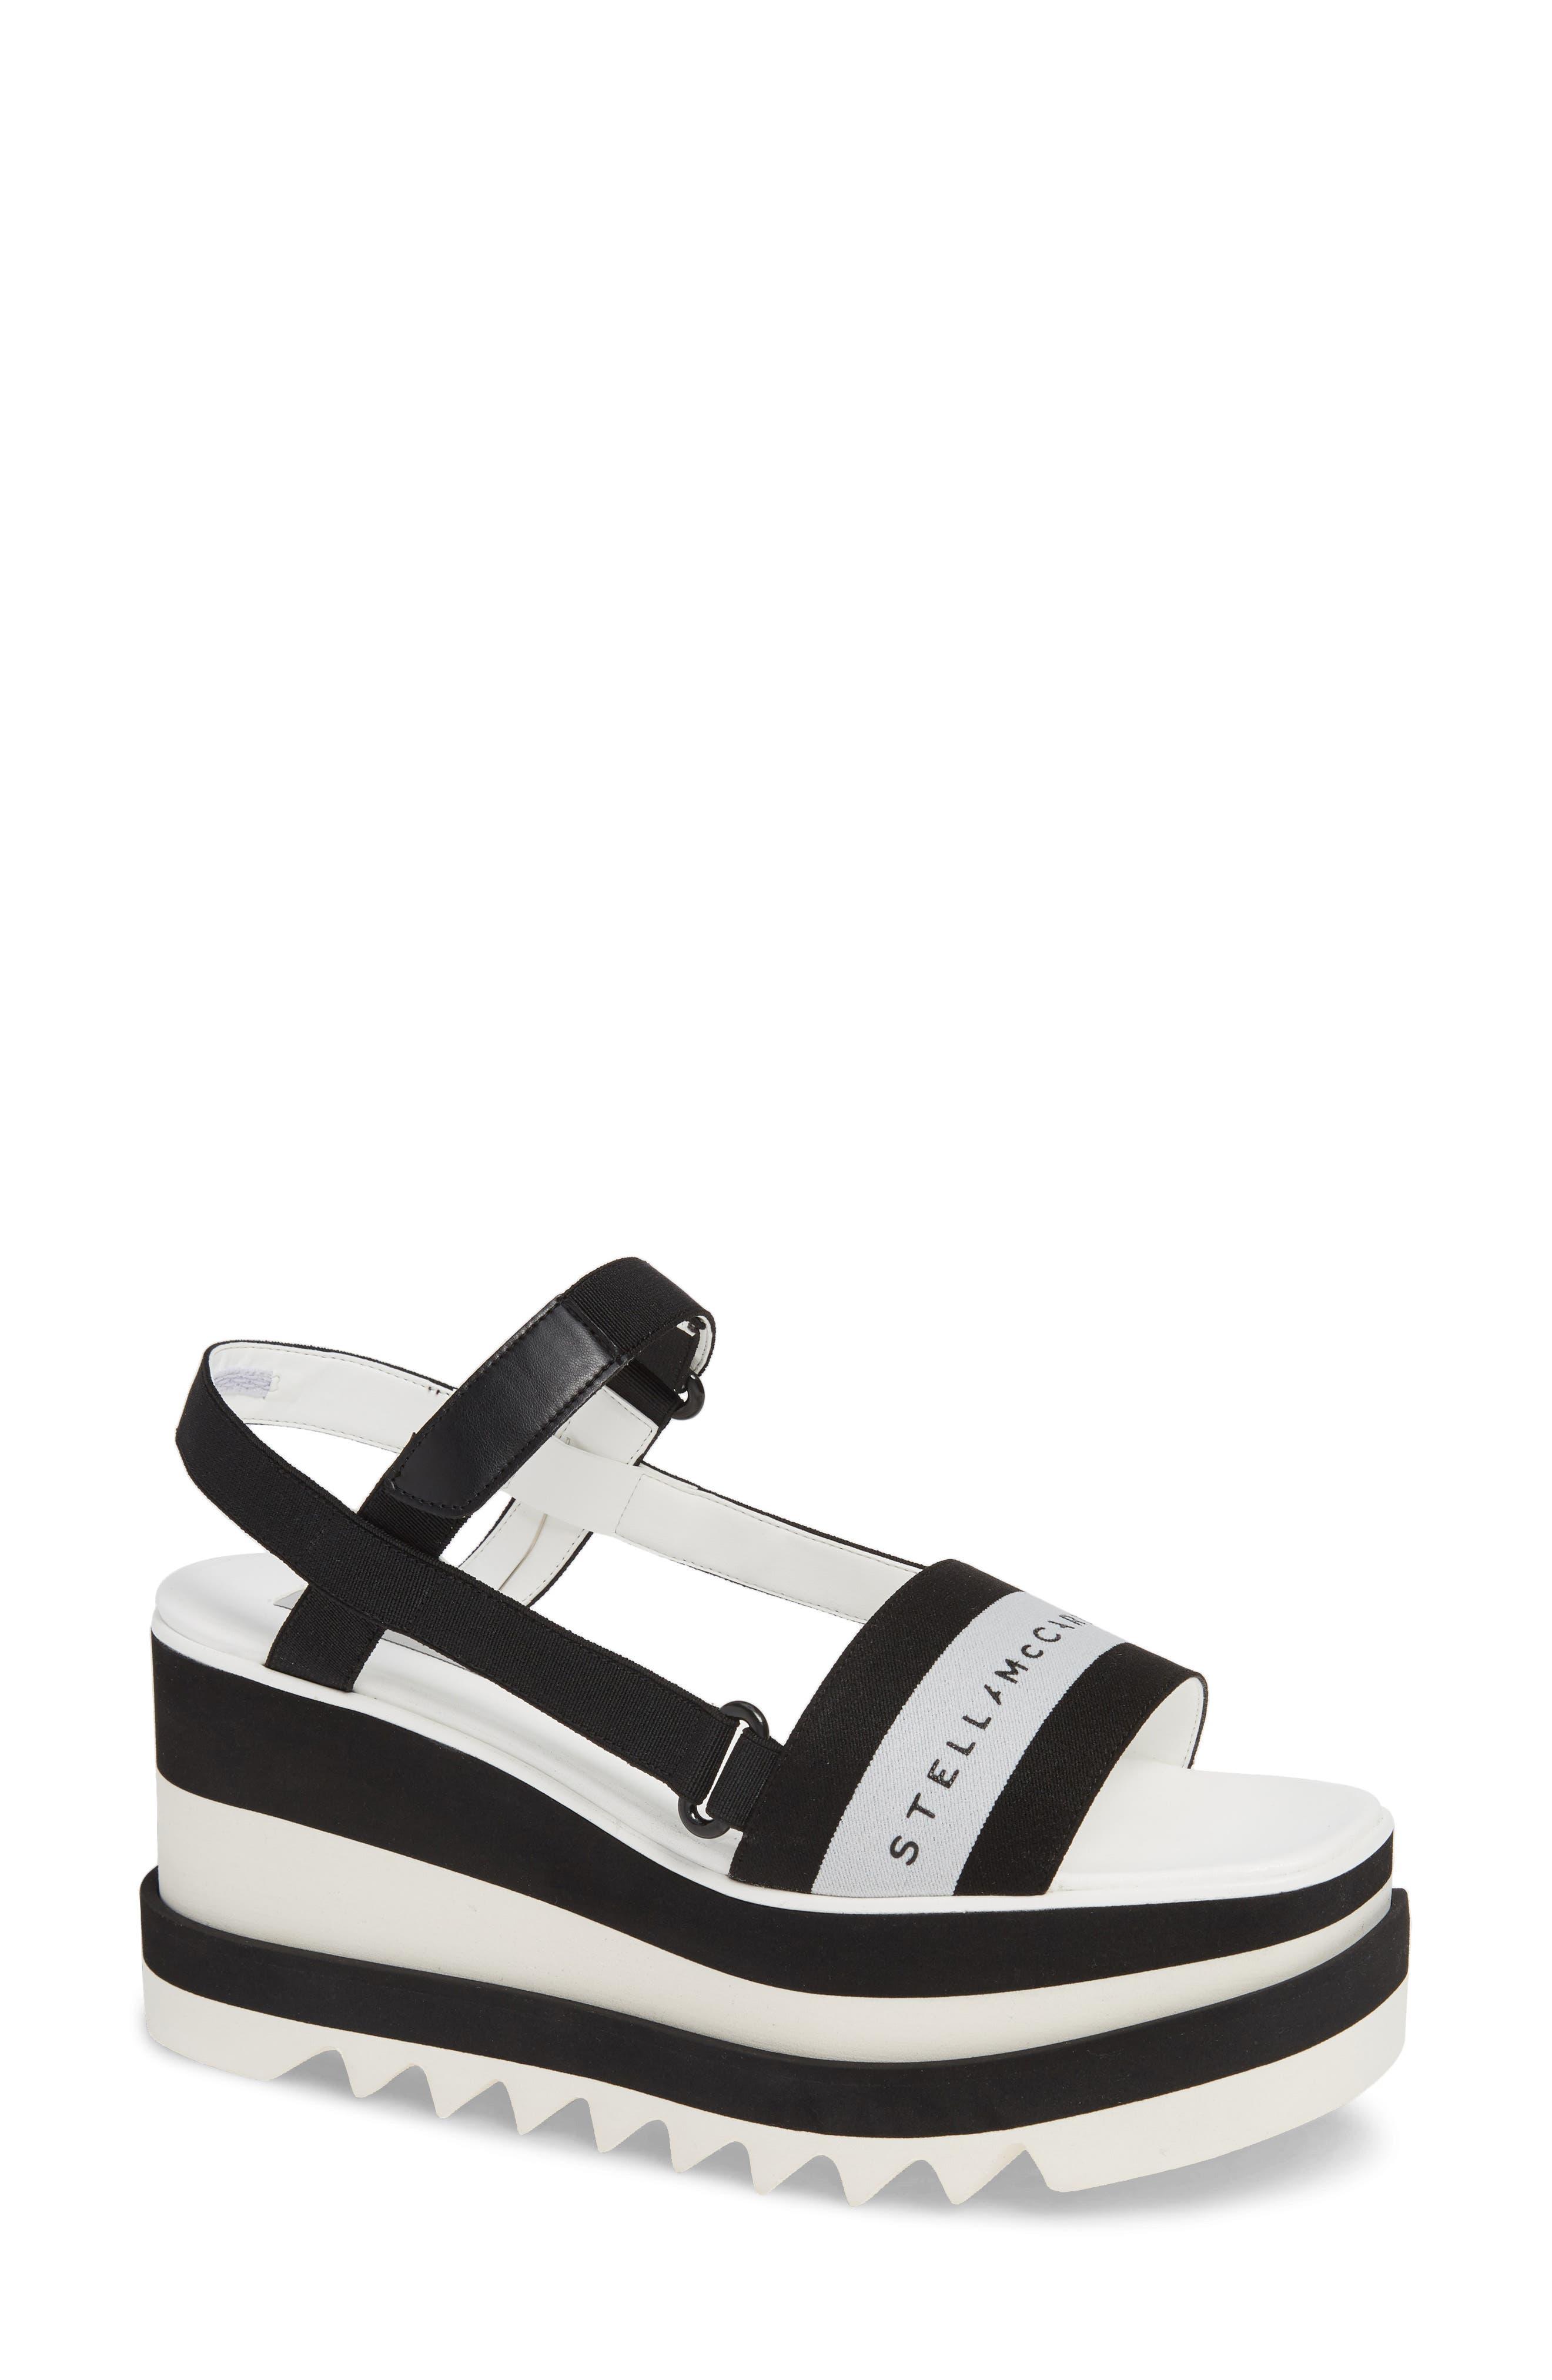 STELLA MCCARTNEY, Stripe Logo Platform Sandal, Main thumbnail 1, color, BLACK/ WHITE